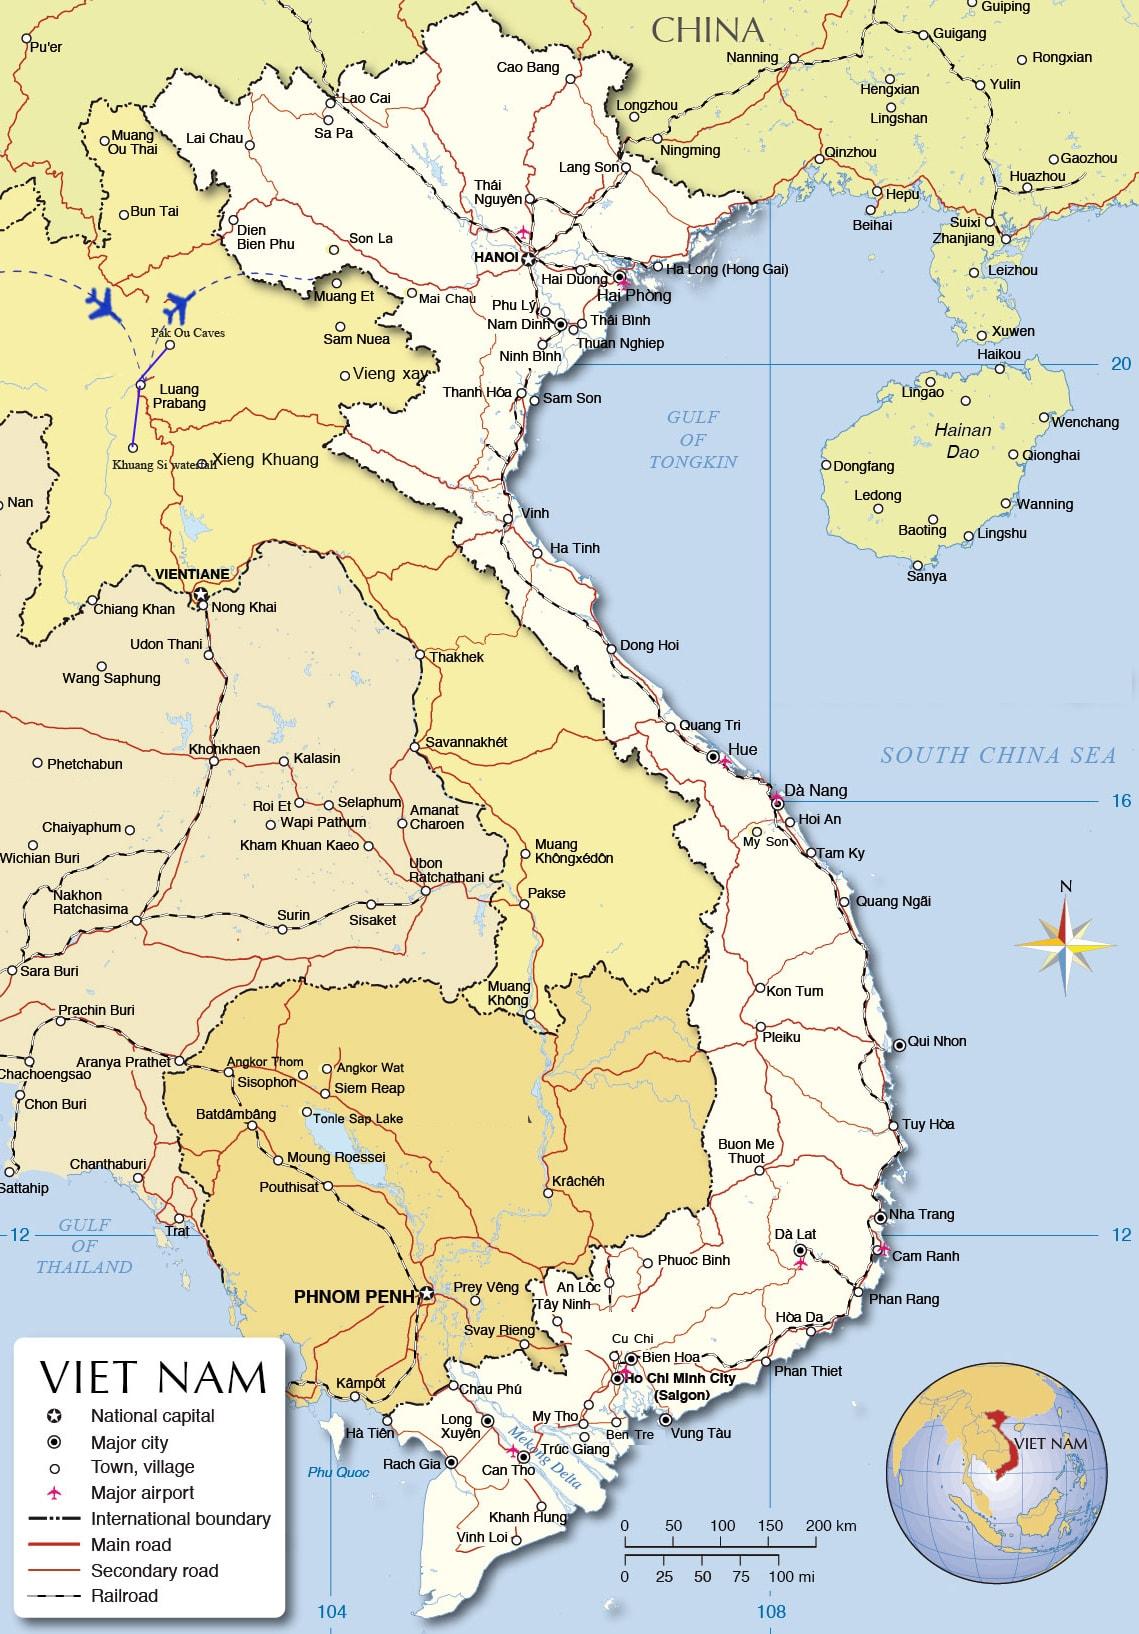 LT02: Best of Luang Prabang - 5 days / 4 nights map